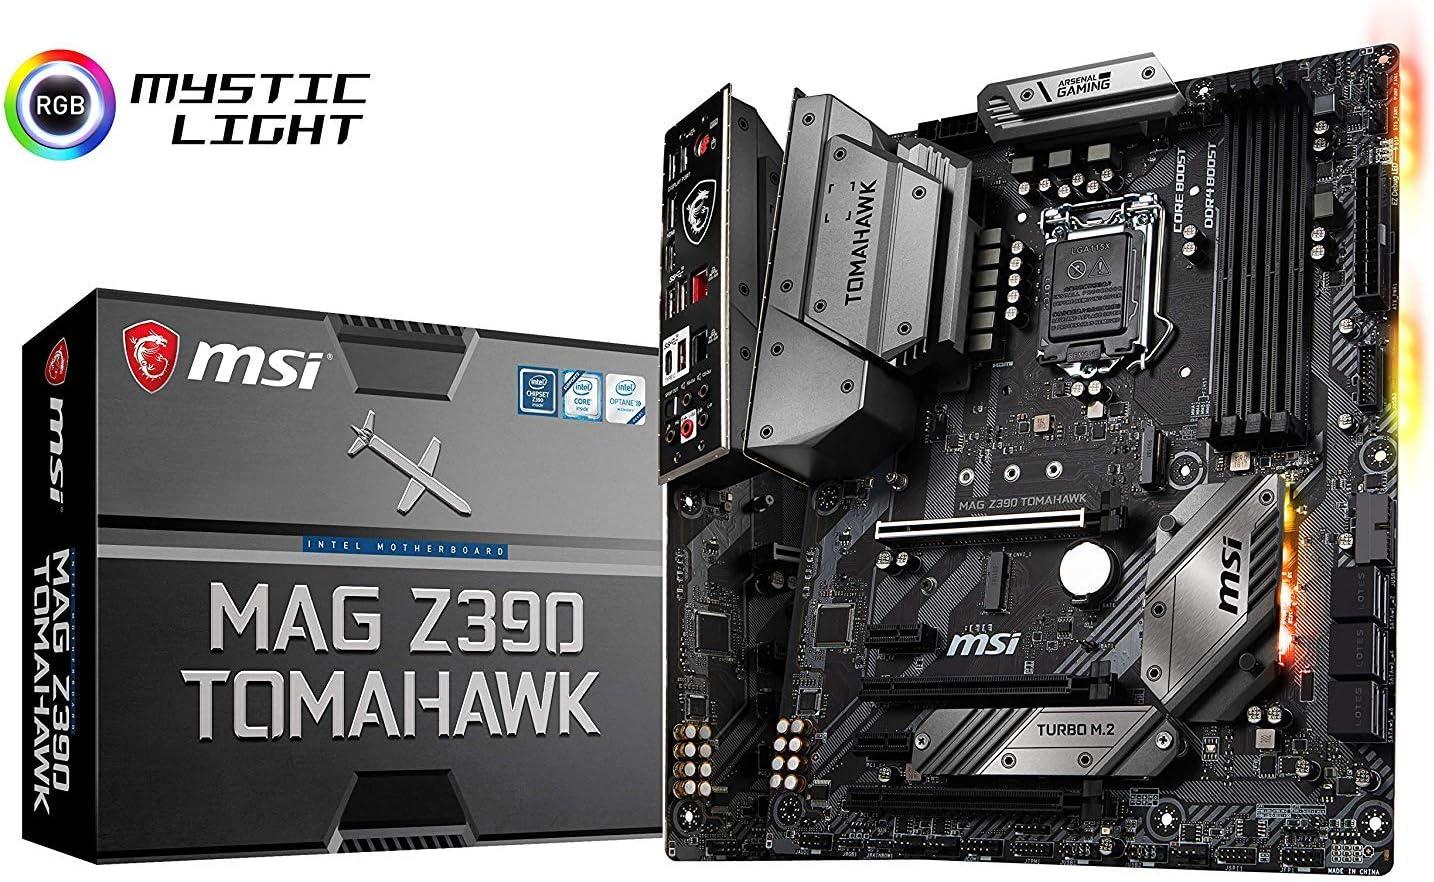 MSI MAG Tomahawk Intel Z390 LGA 1151 ATX DDR4-SDRAM Motherboard